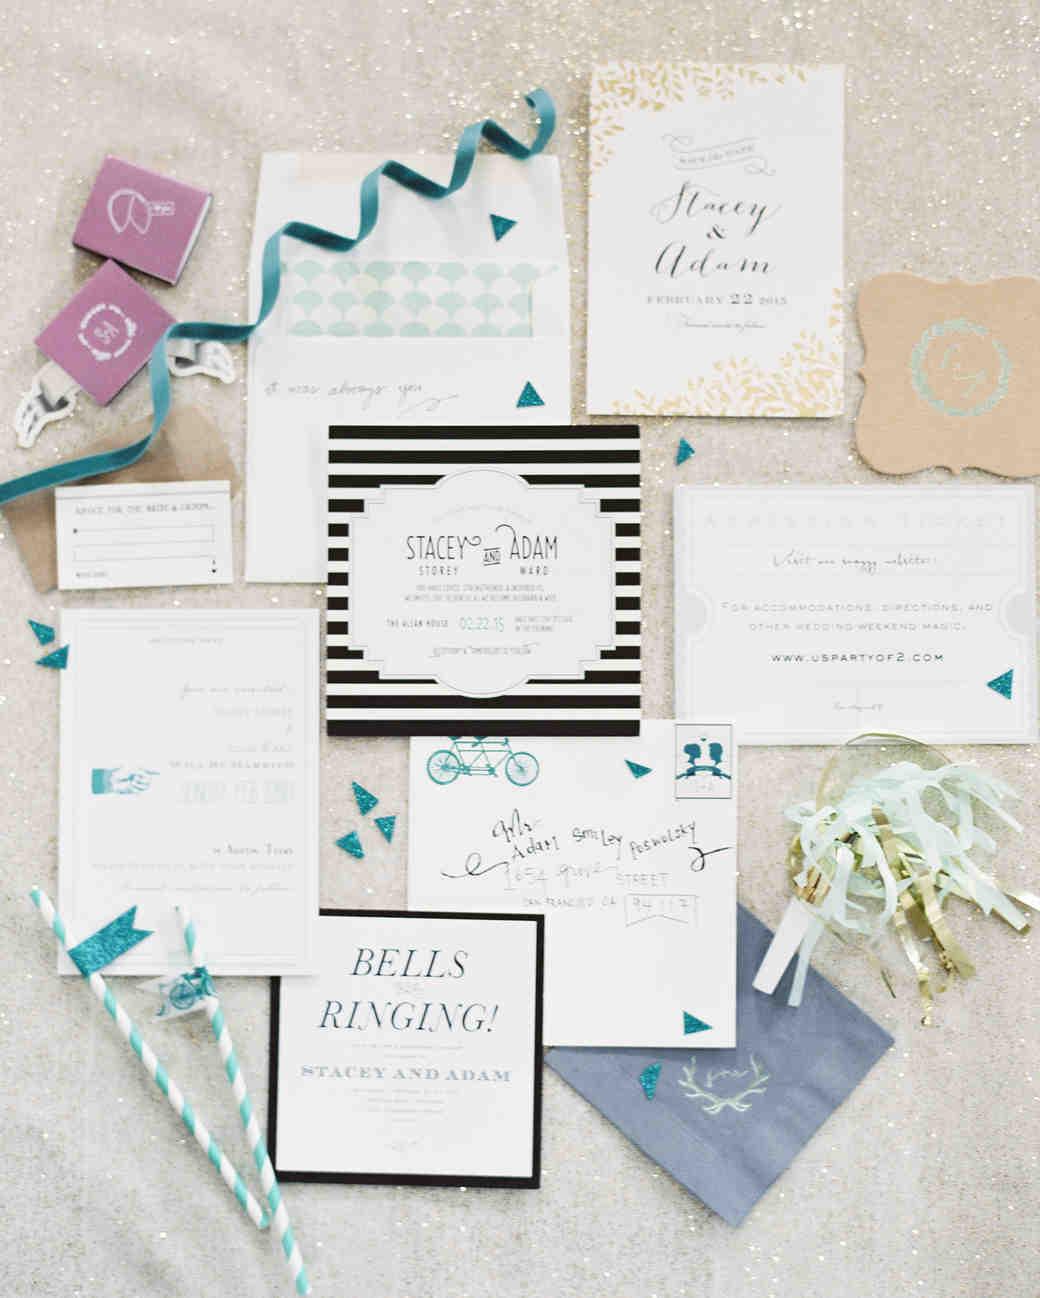 stacey-adam-wedding-stationery-0005-s112112-0815.jpg